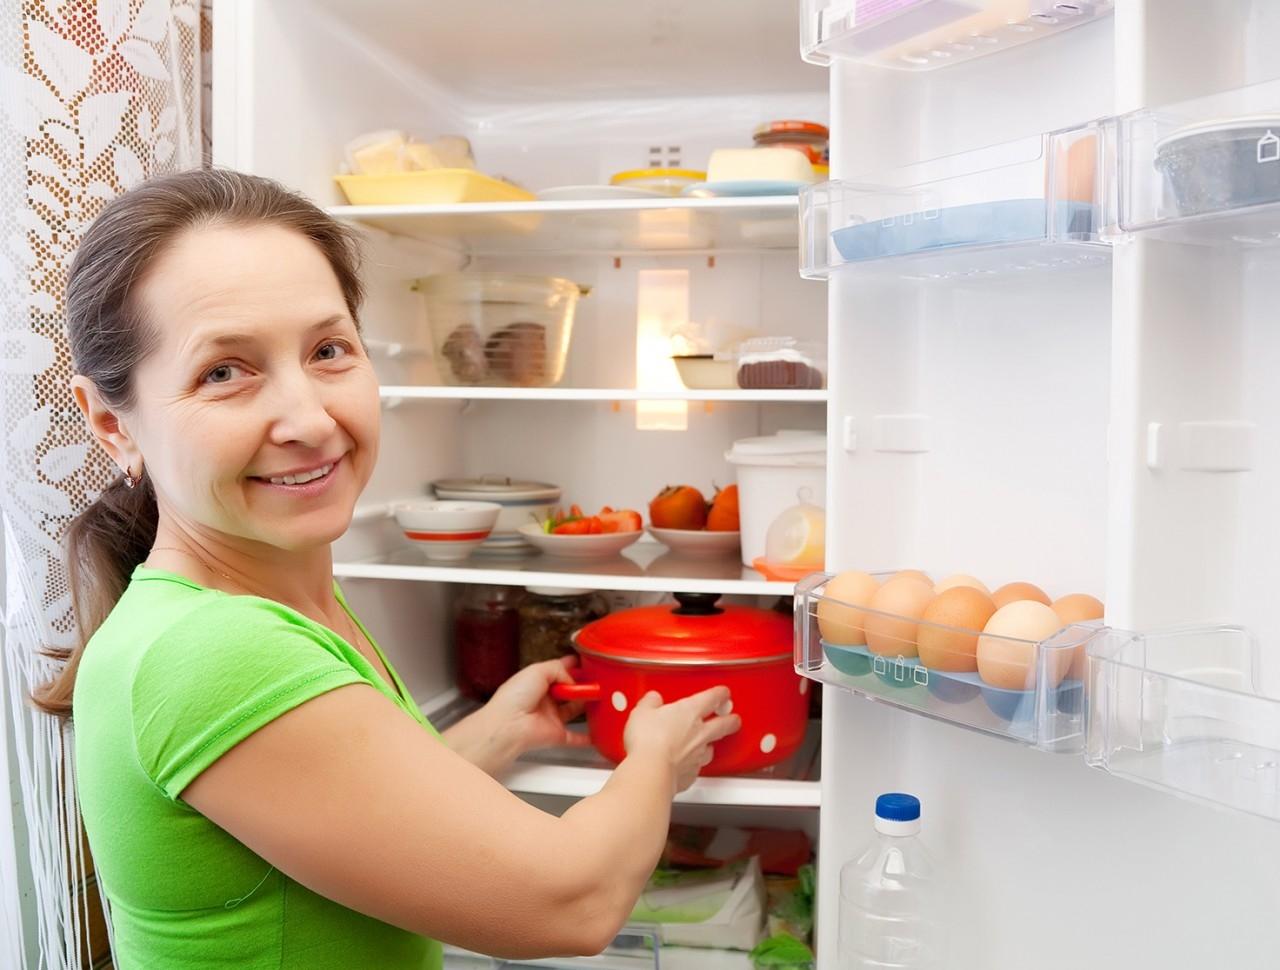 Fäst kompressorn i kylskåpet med gummikuddar.